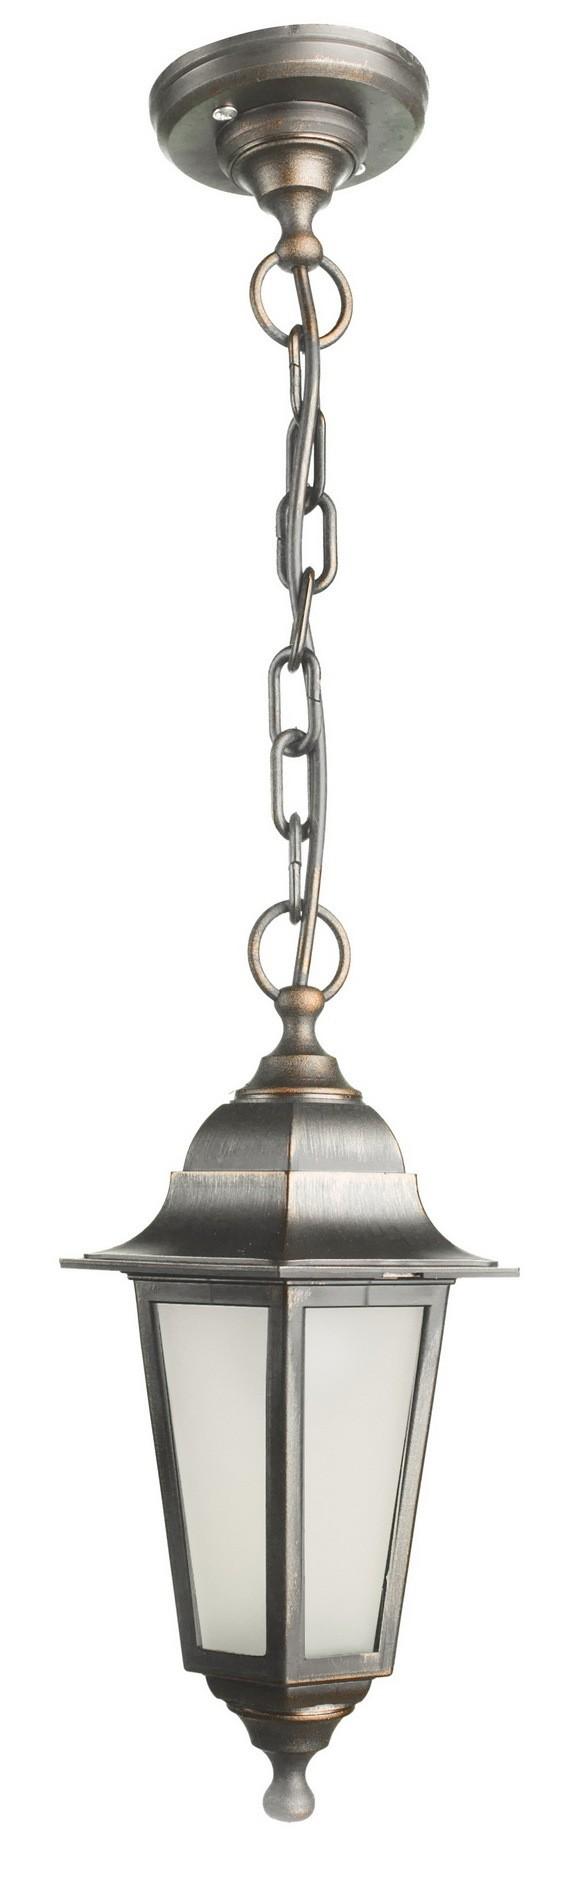 Светильник уличный Arte lamp A1216so-1bk